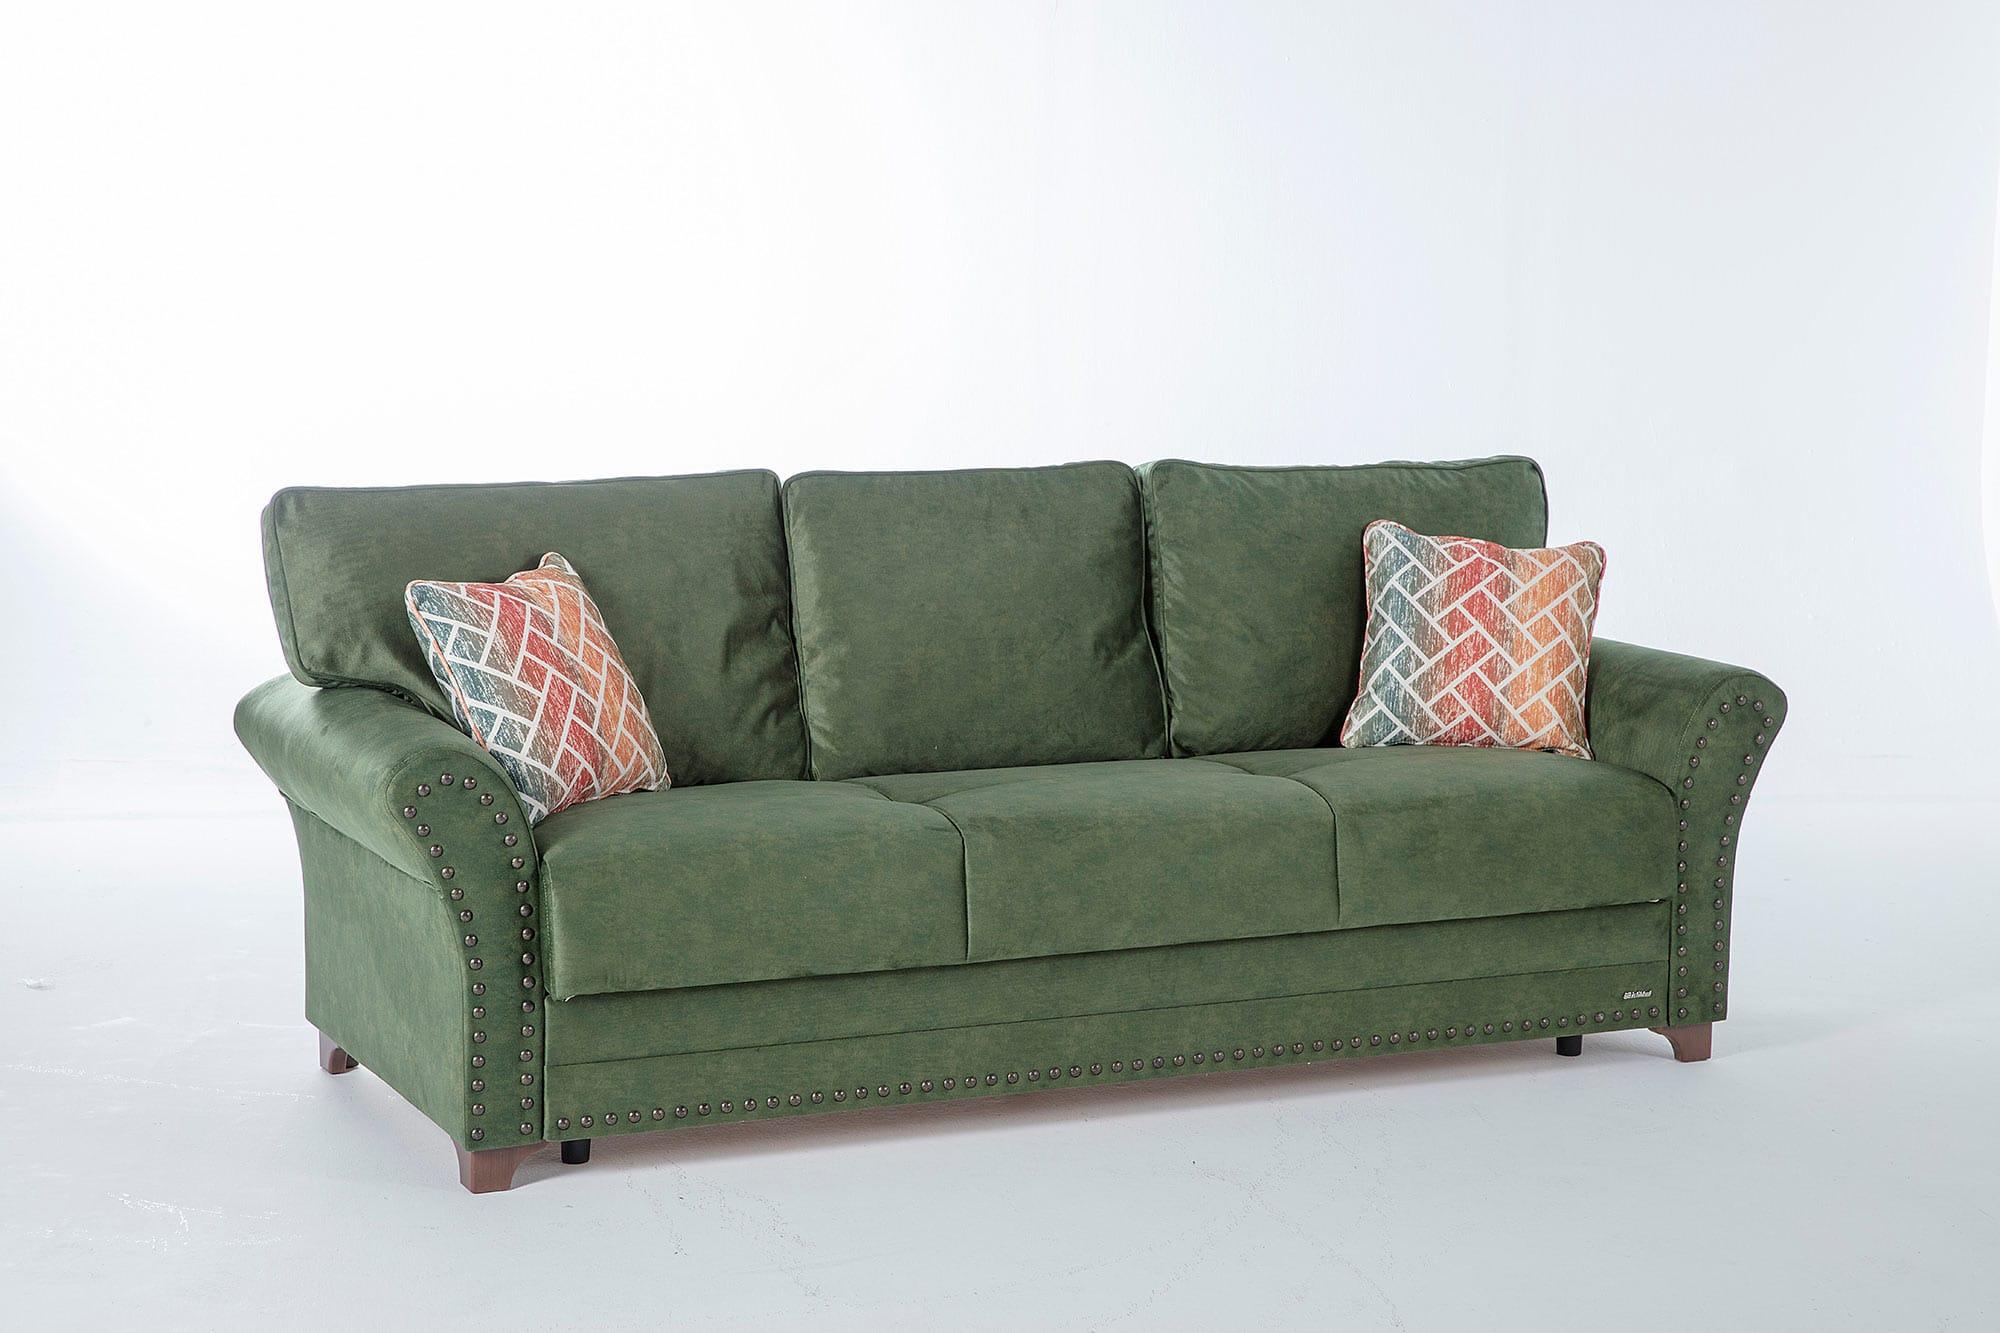 Brady Samba Green W Memory Foam Convertible Sofa Bed By Istikbal Sunset